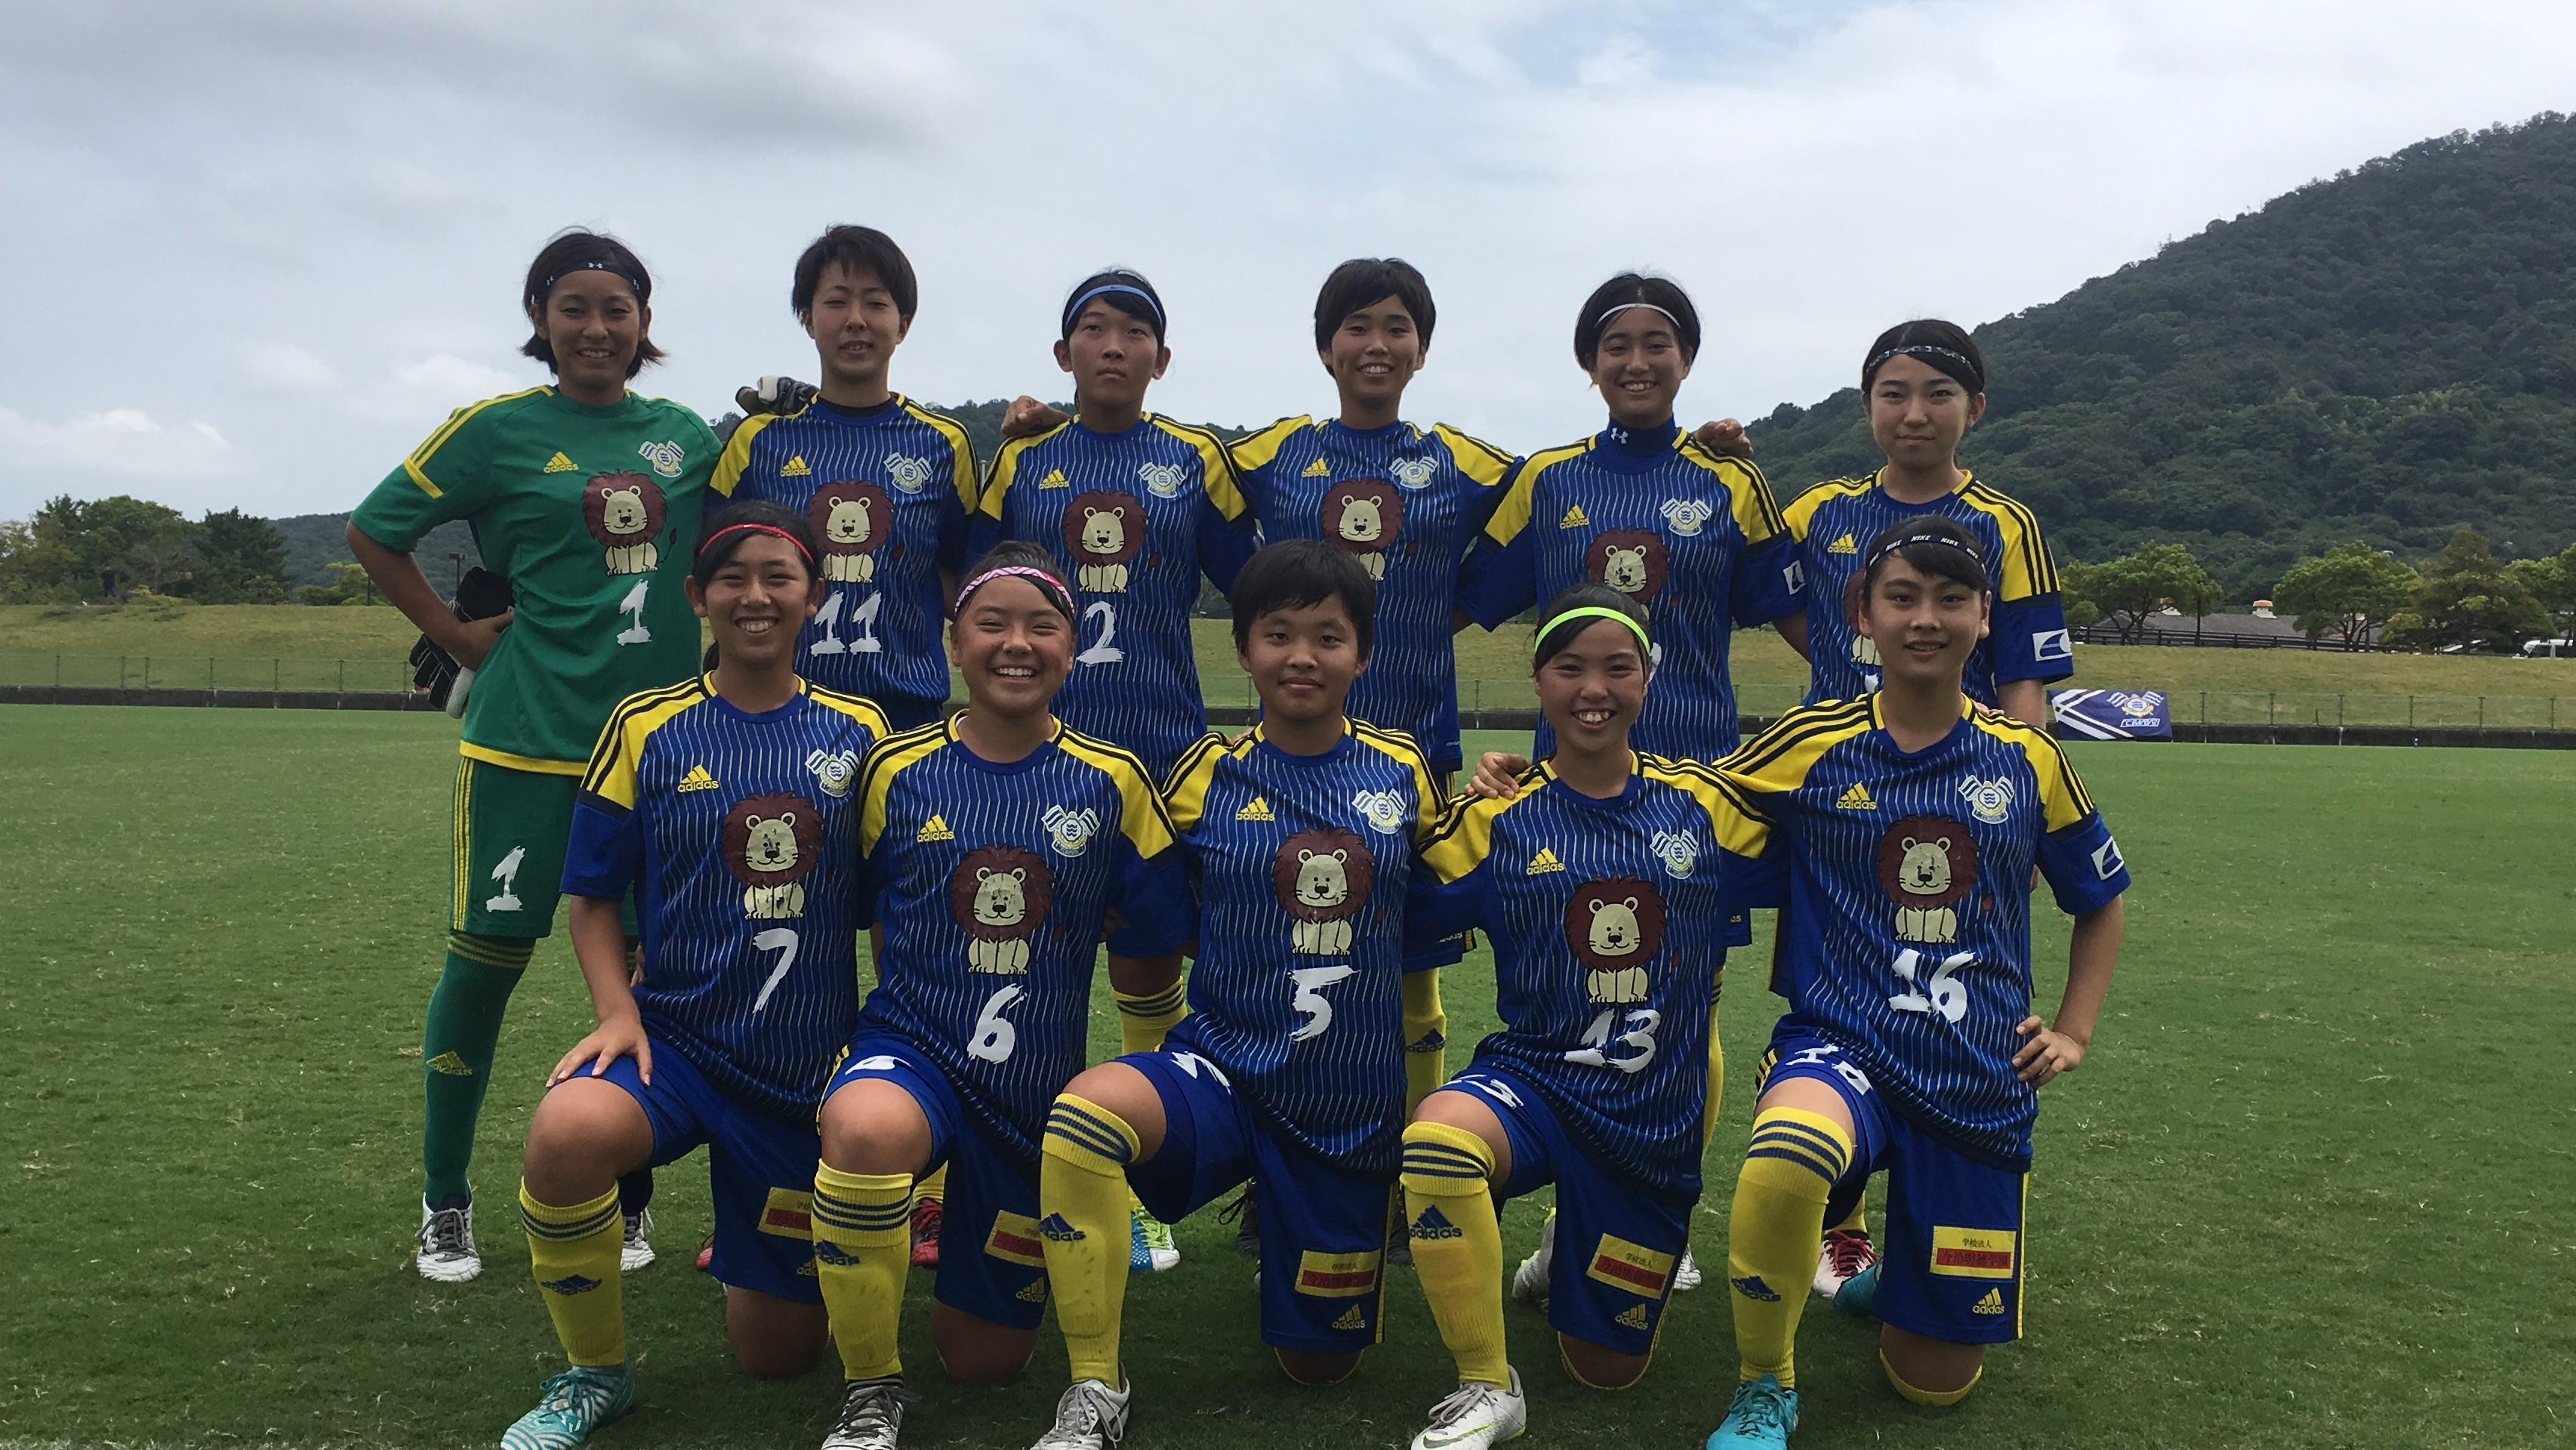 2018_kogocup_shikokuarea.jpeg